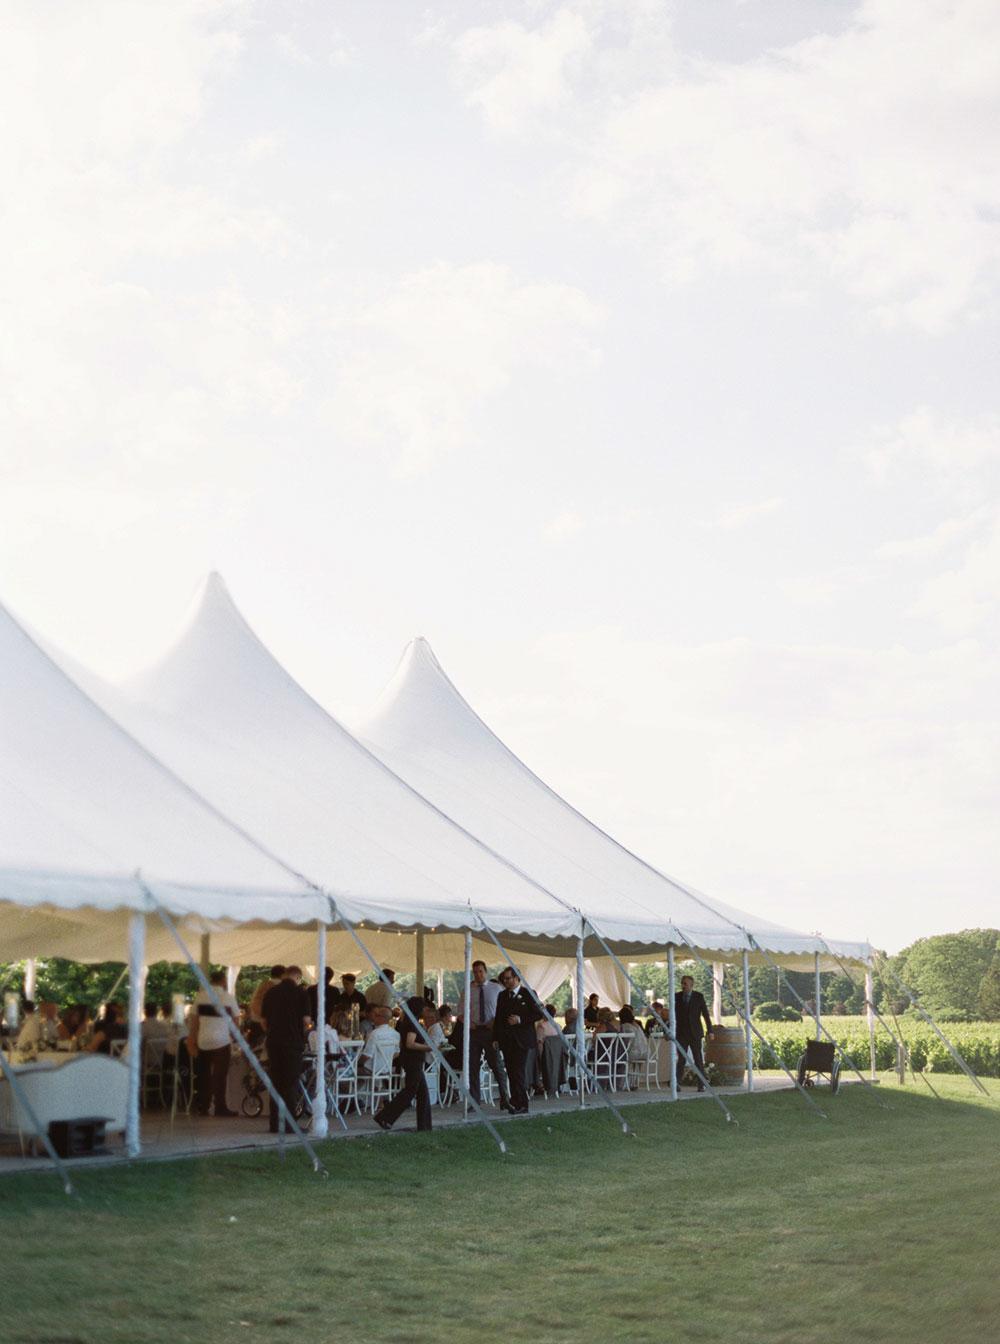 kurtz-orchards-wedding-gracewood-estate-niagara-on-the-lake-photo-by-katie-nicolle-photography-0088.JPG